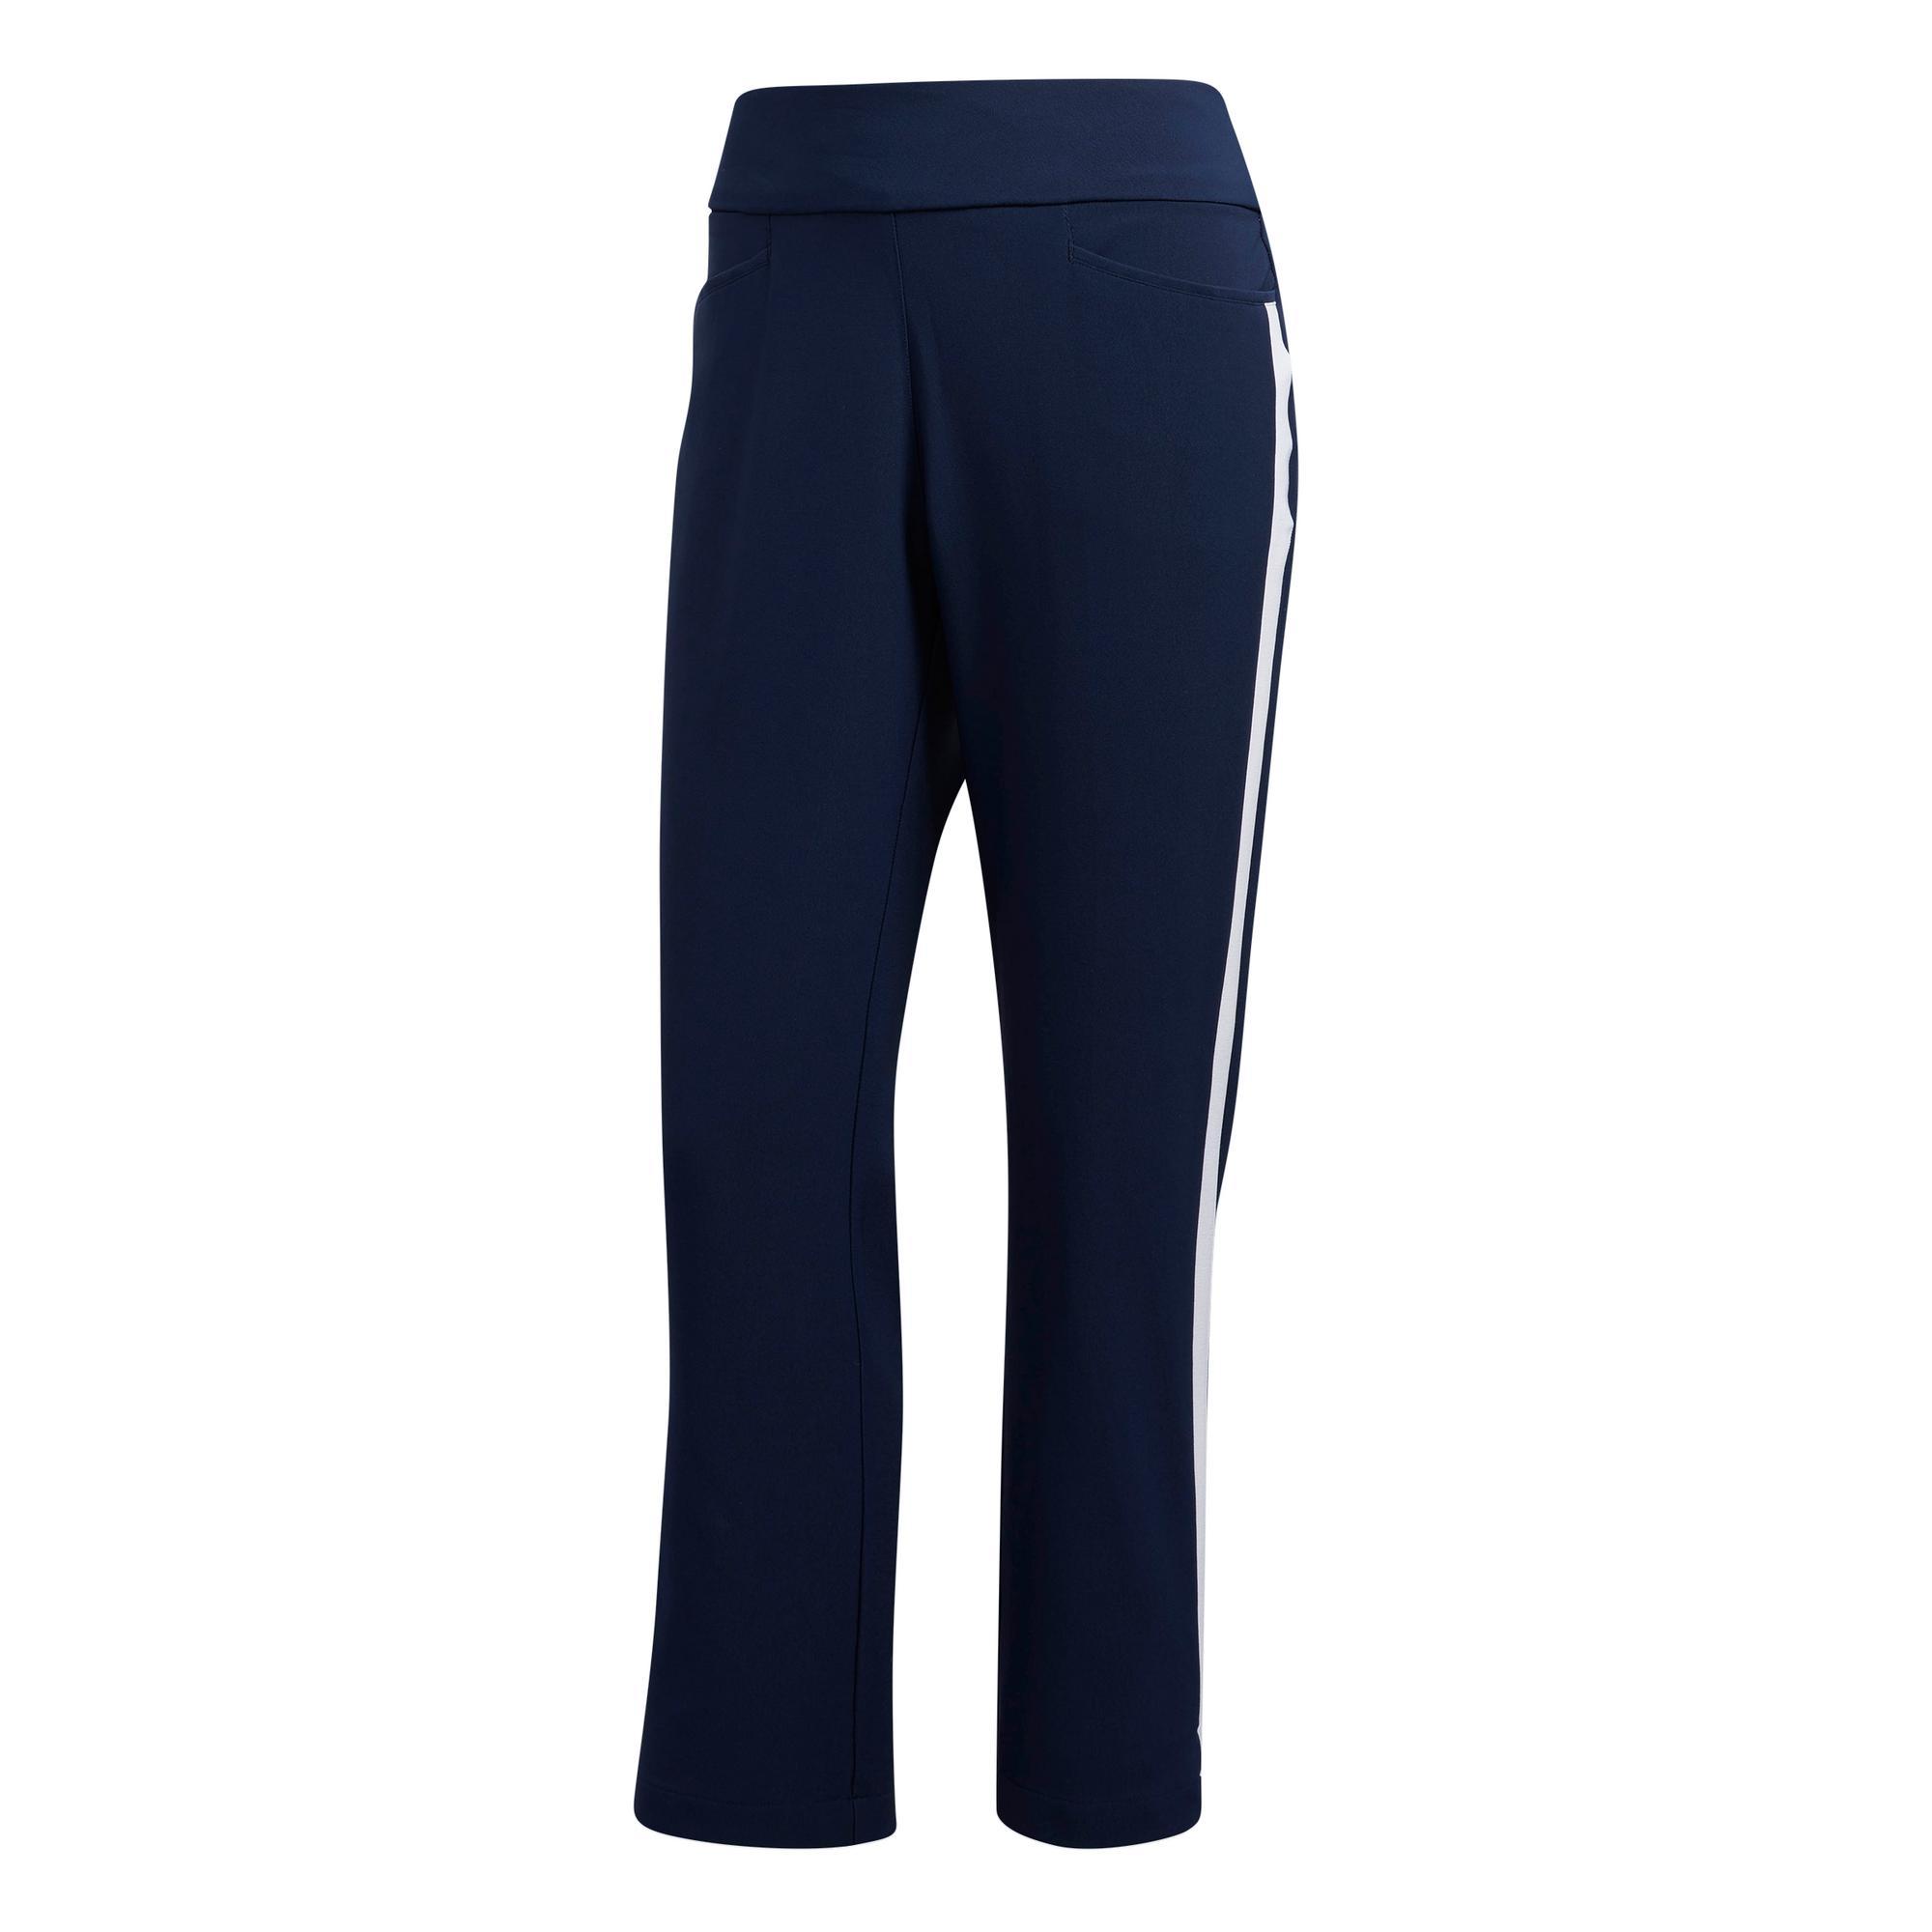 Women's Sport Performance Ultimate Novlety Crop Pant